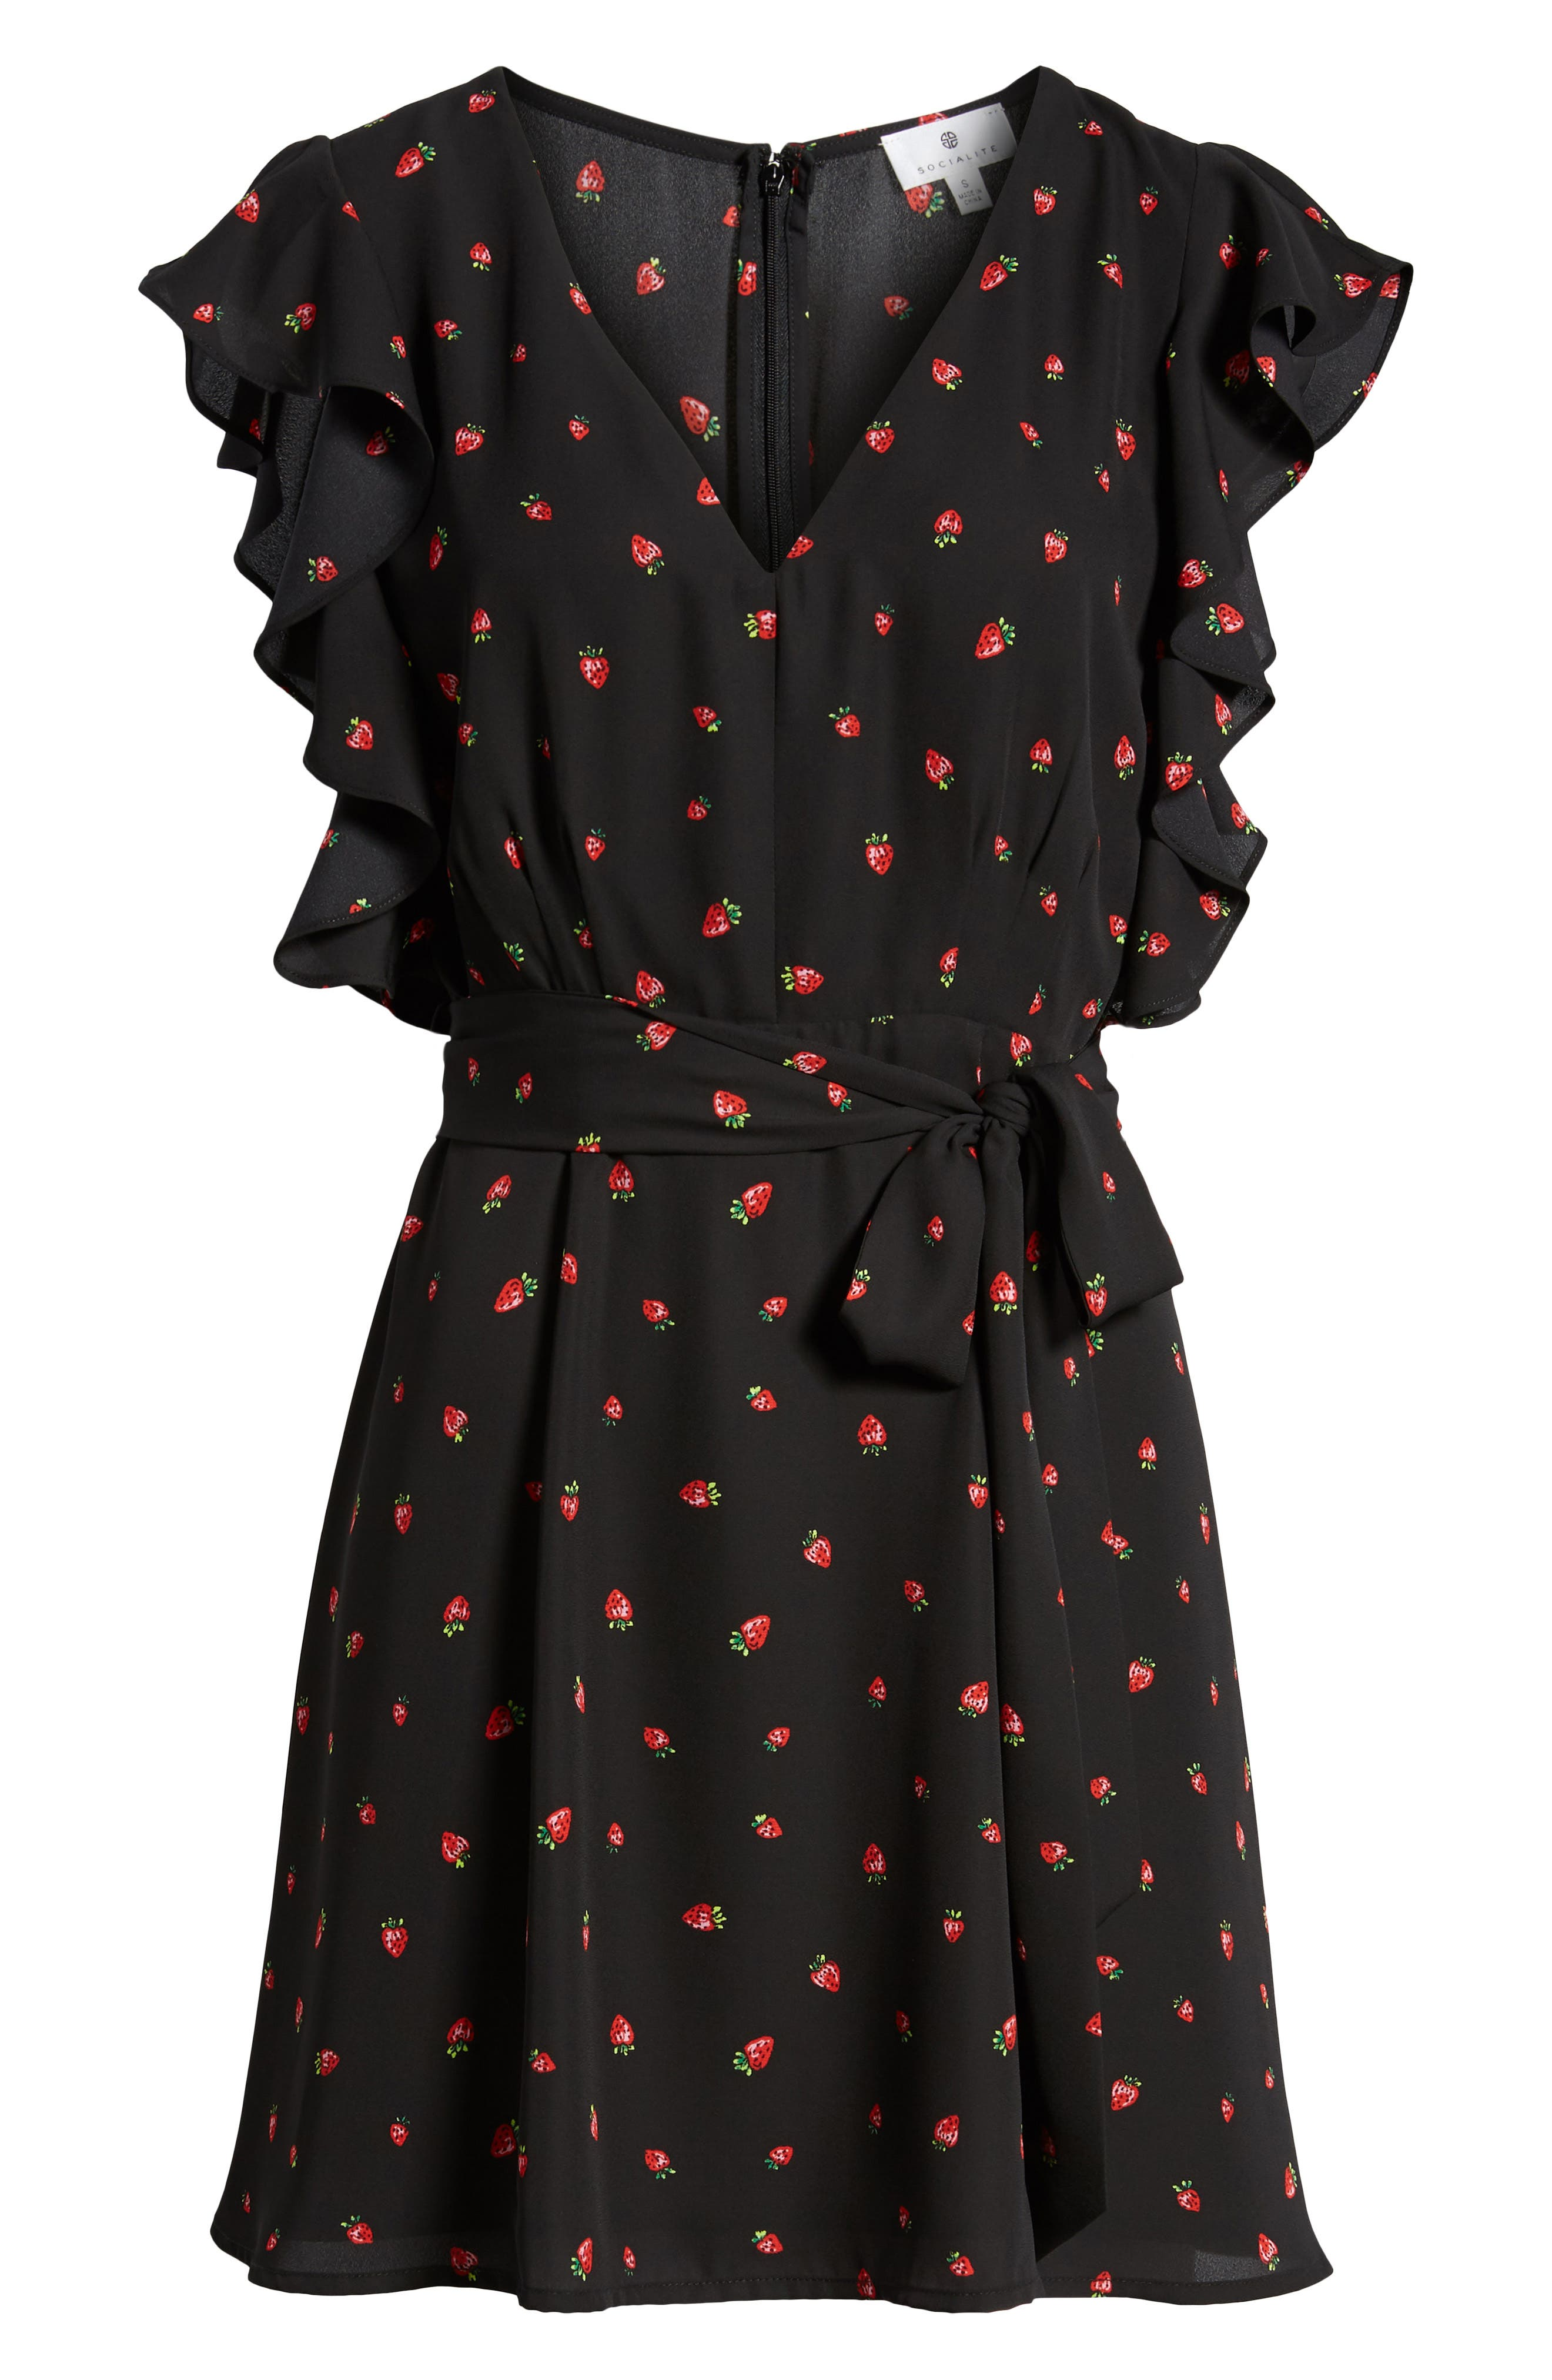 Ruffle Sleeve Dress,                             Alternate thumbnail 7, color,                             Strawberry Print